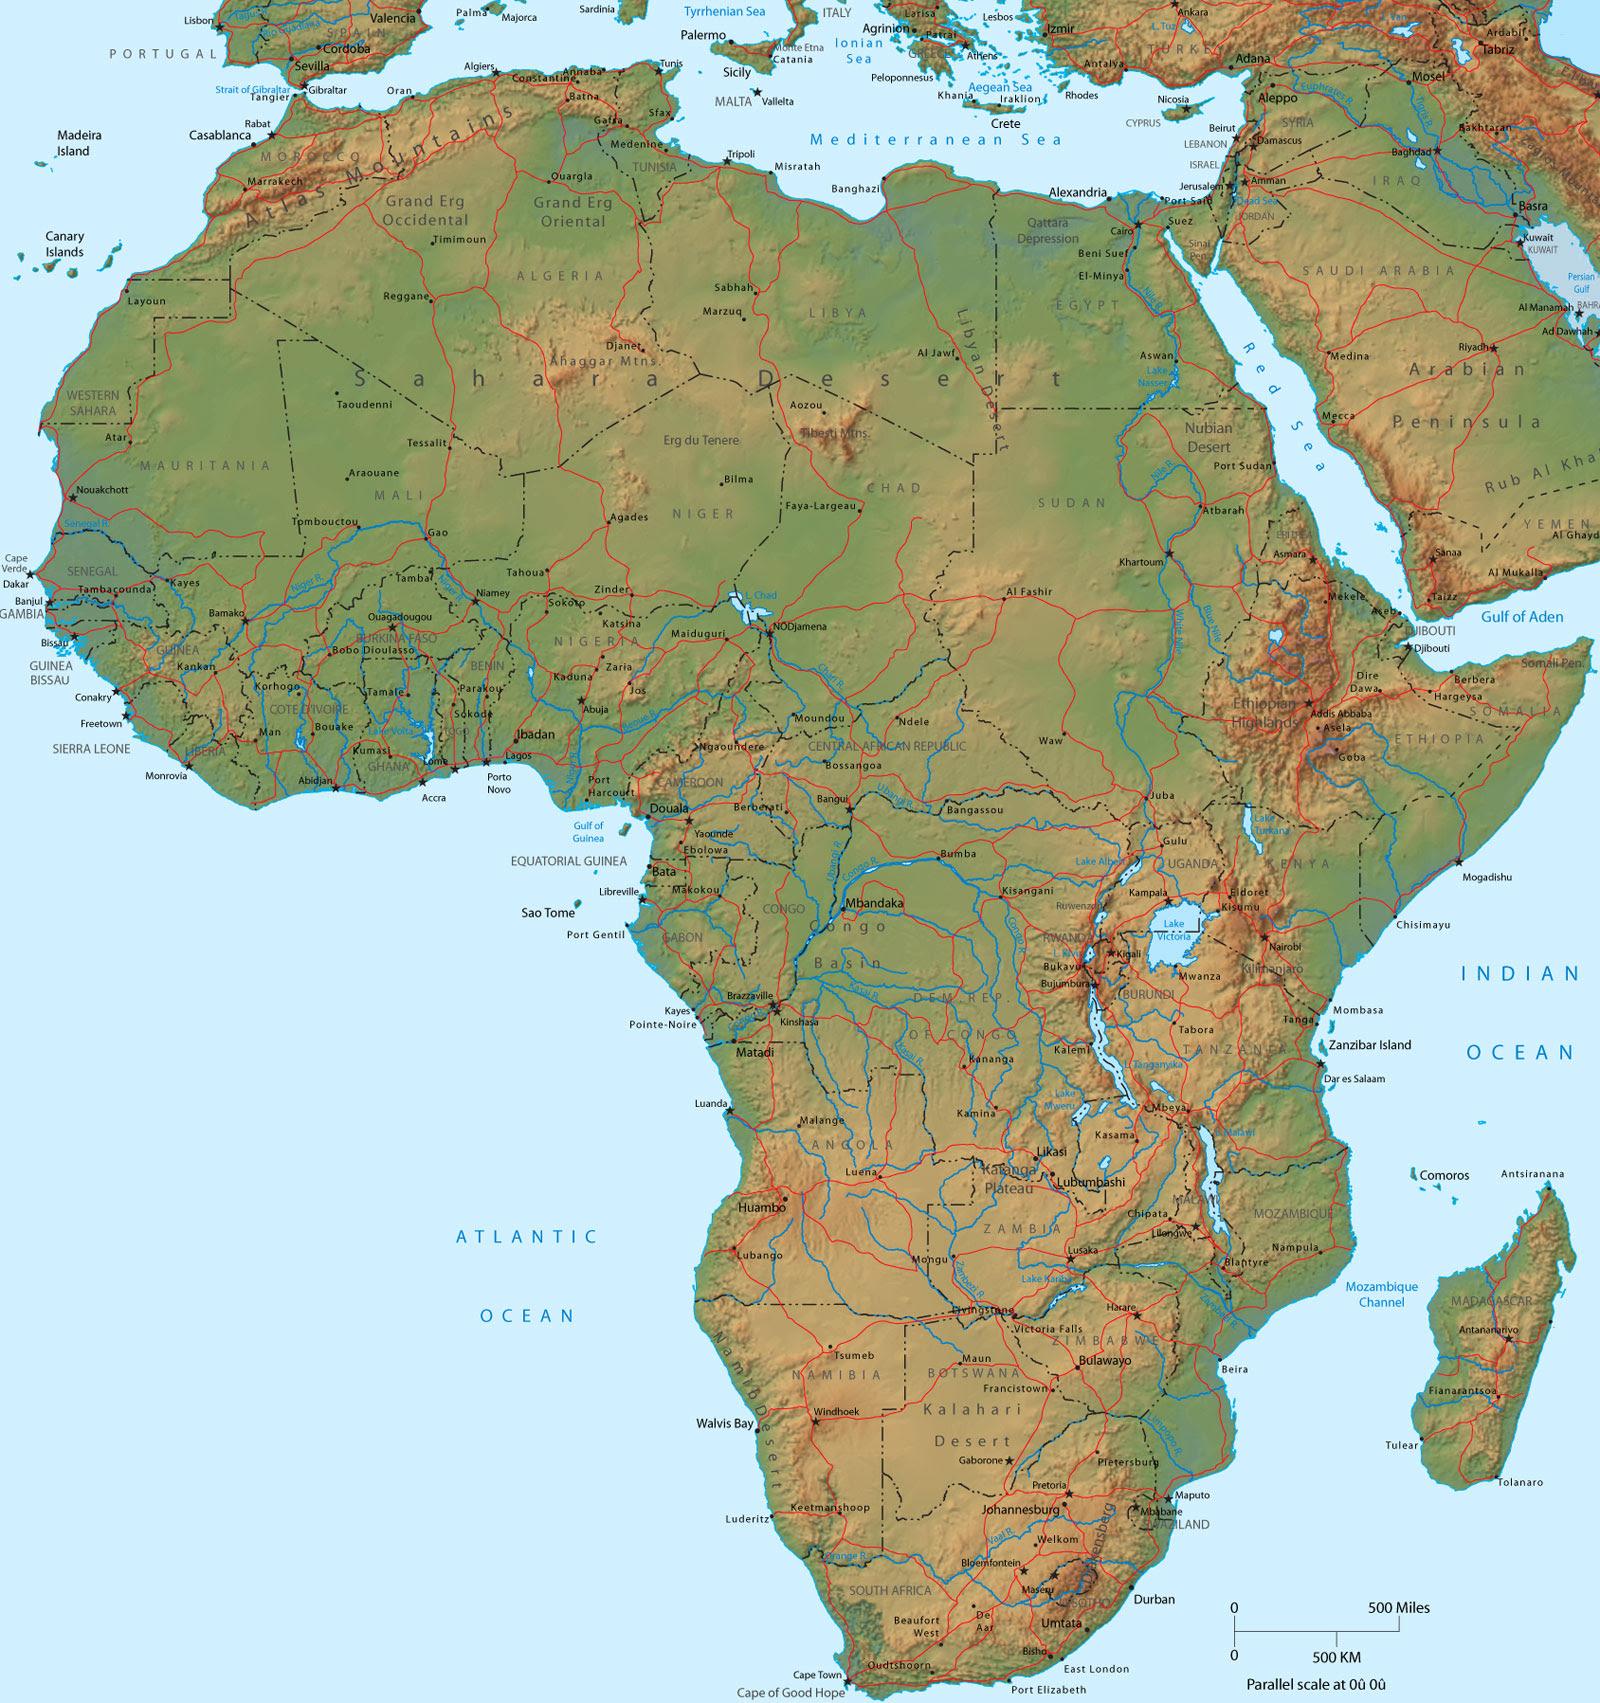 Mapsingen: AFRICA MAP